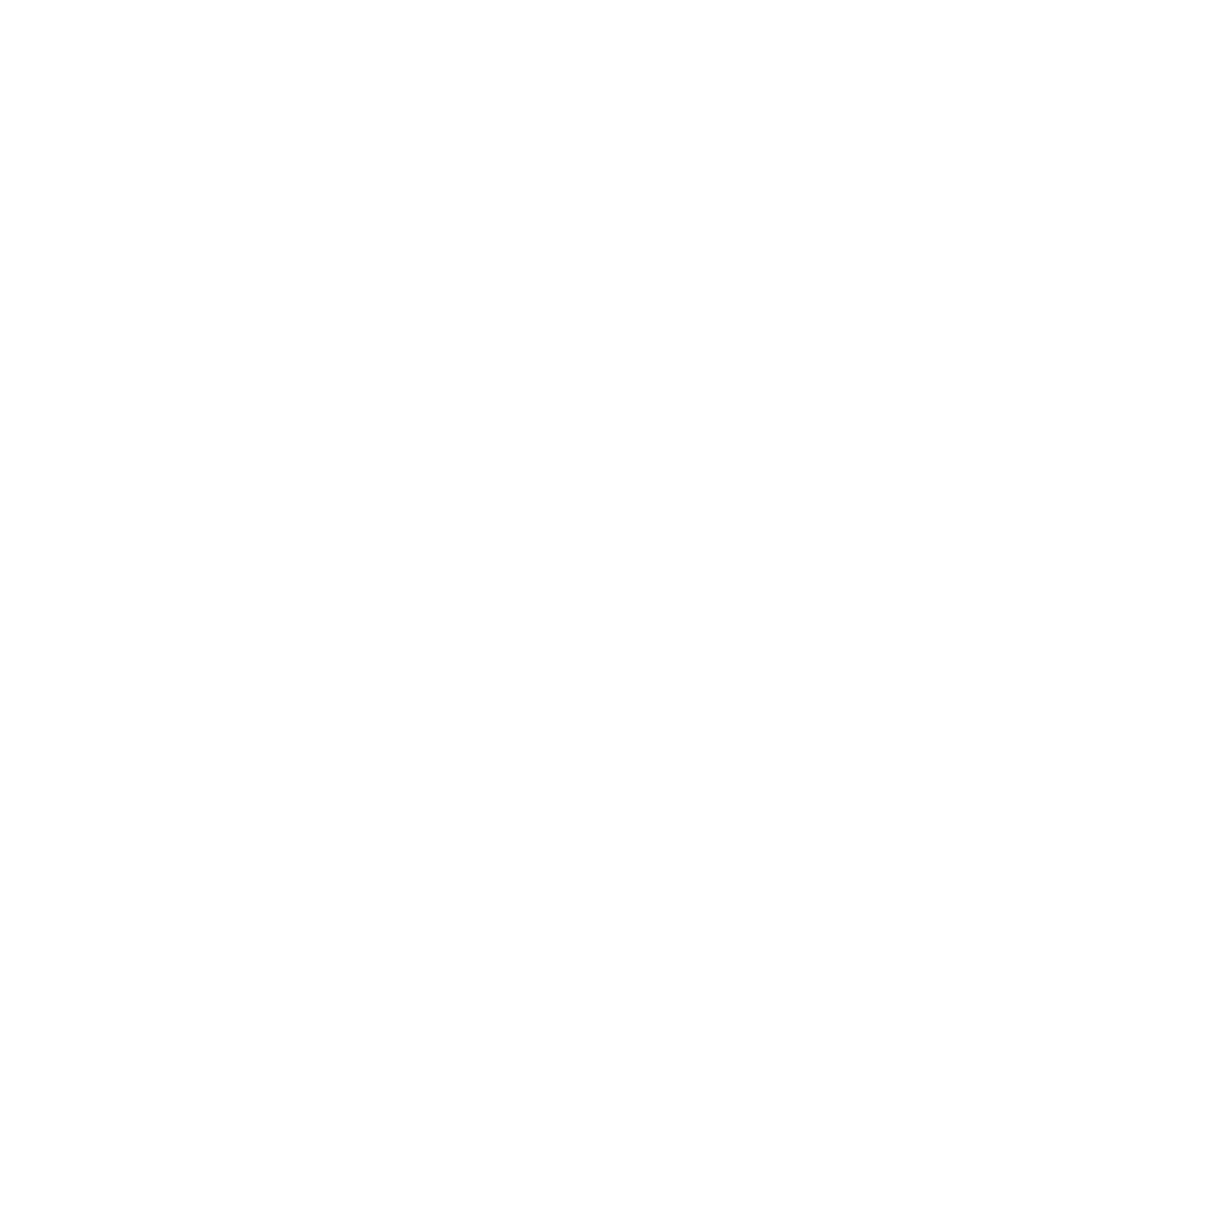 LAPBC Video